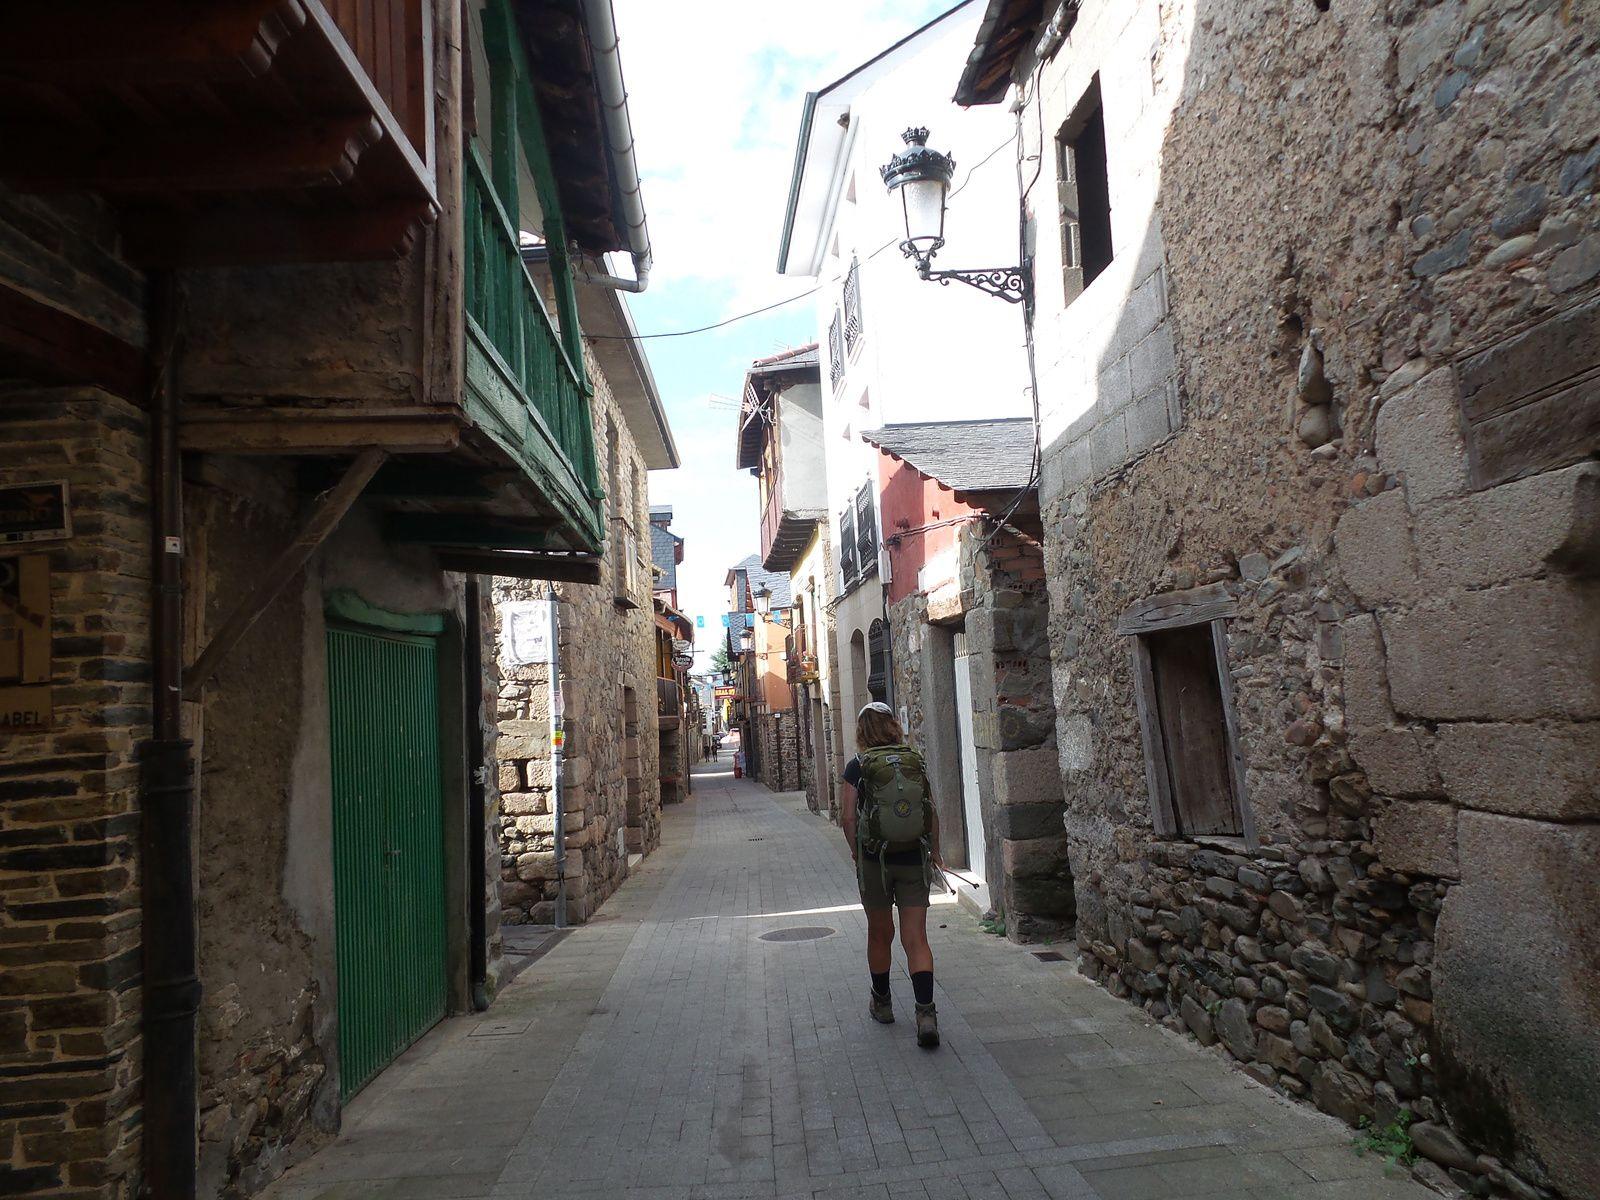 Bonne descente jusqu'à Molinaseca